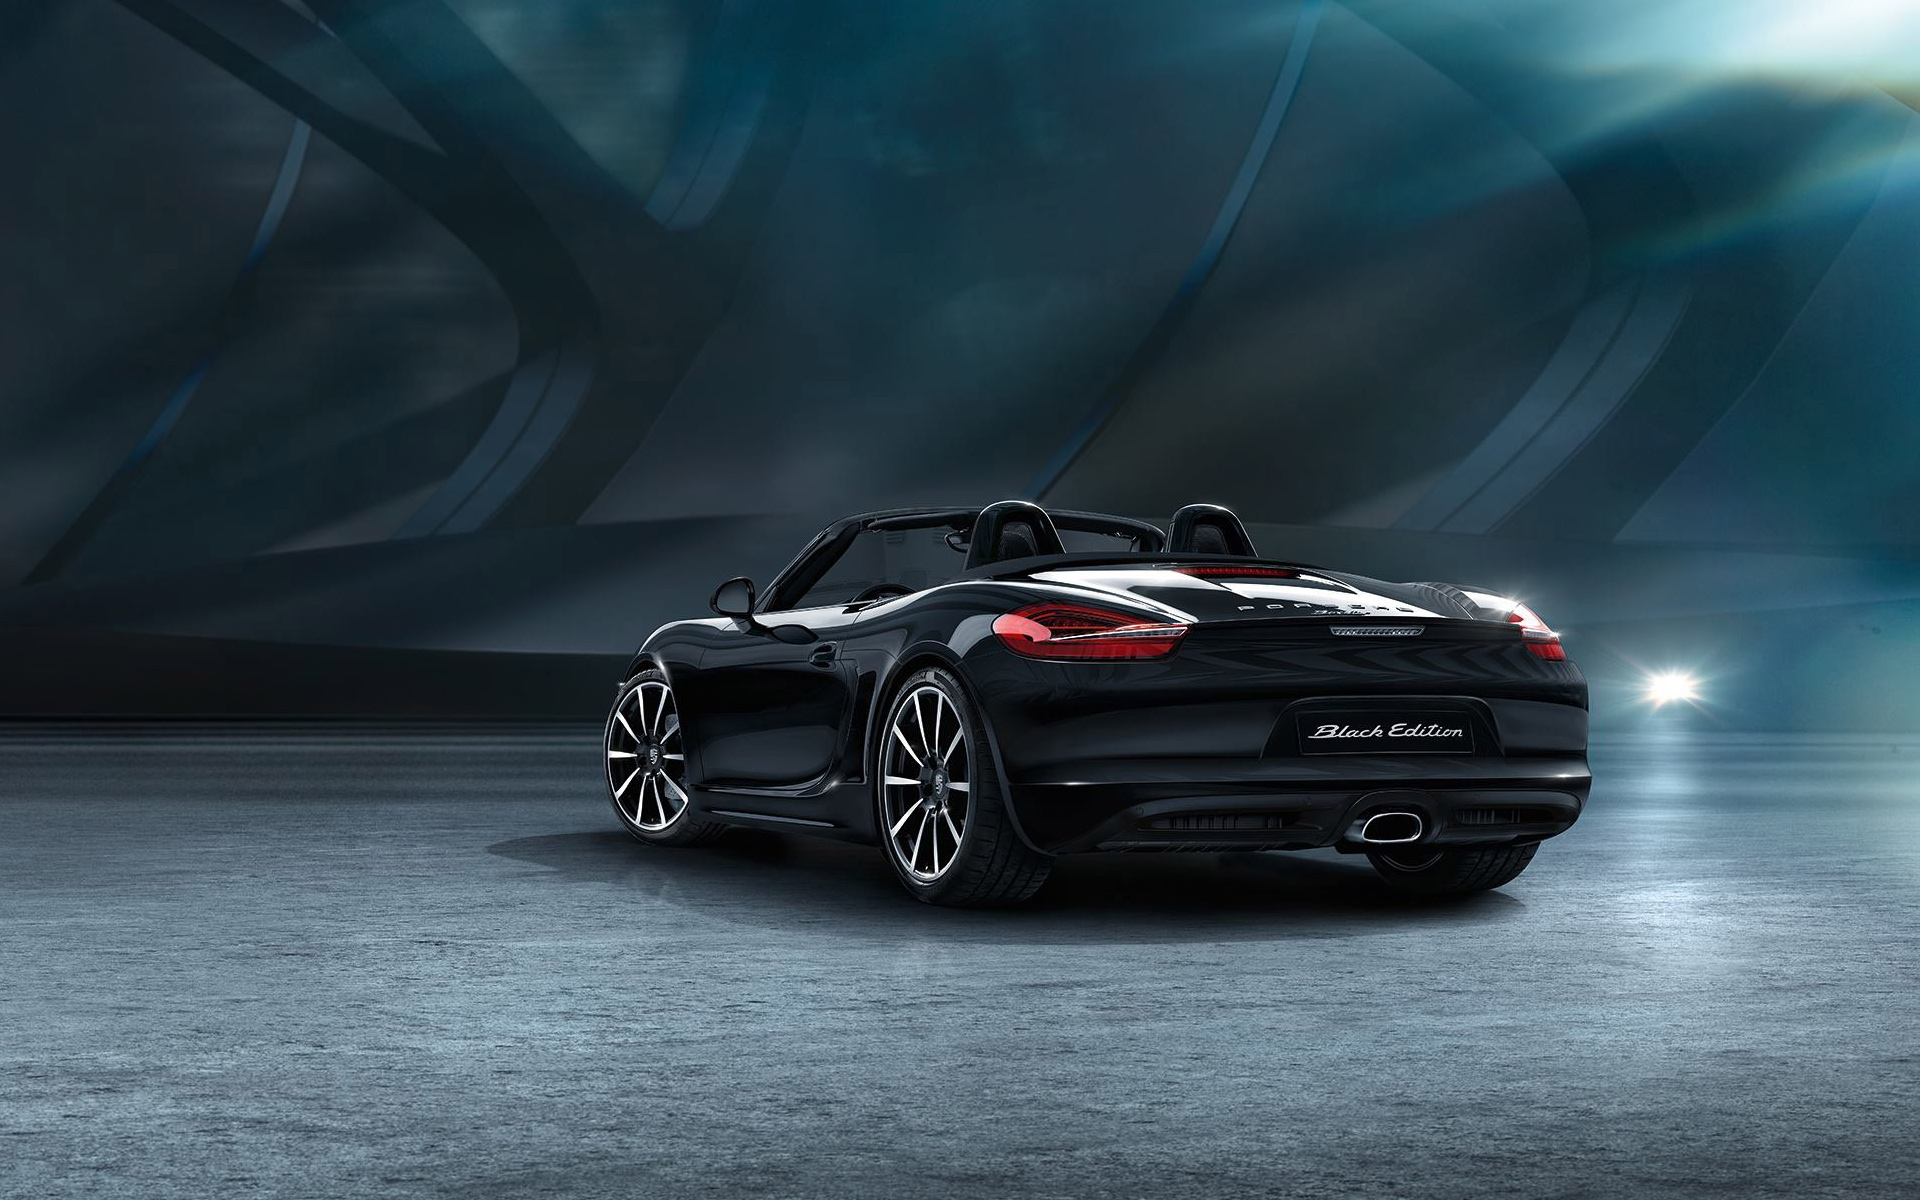 Hummer Car Wallpapers Black 2015 Porsche Boxster Black Edition 2 Wallpaper Hd Car